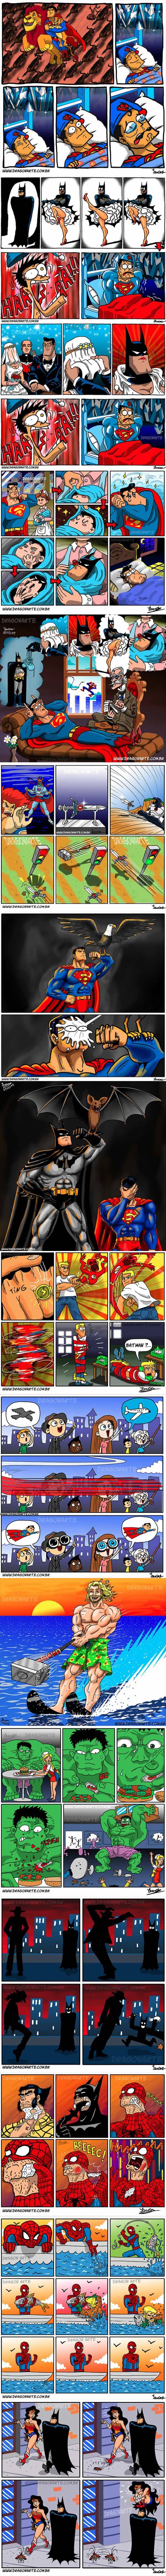 The Funniest Superhero Comics Collection (Part 2)